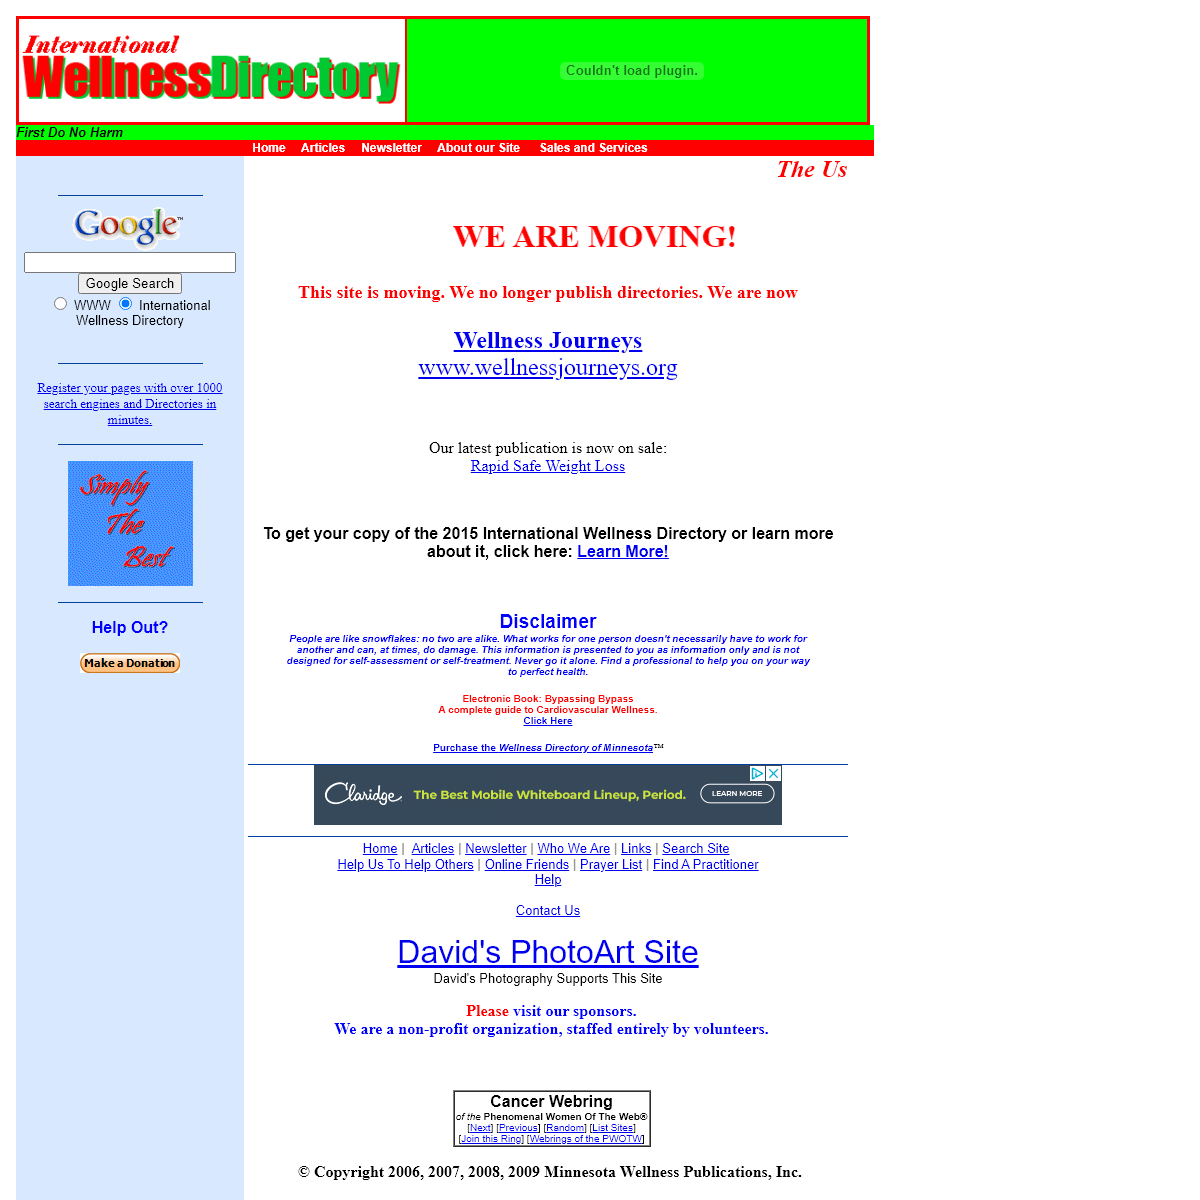 International Wellness Directory